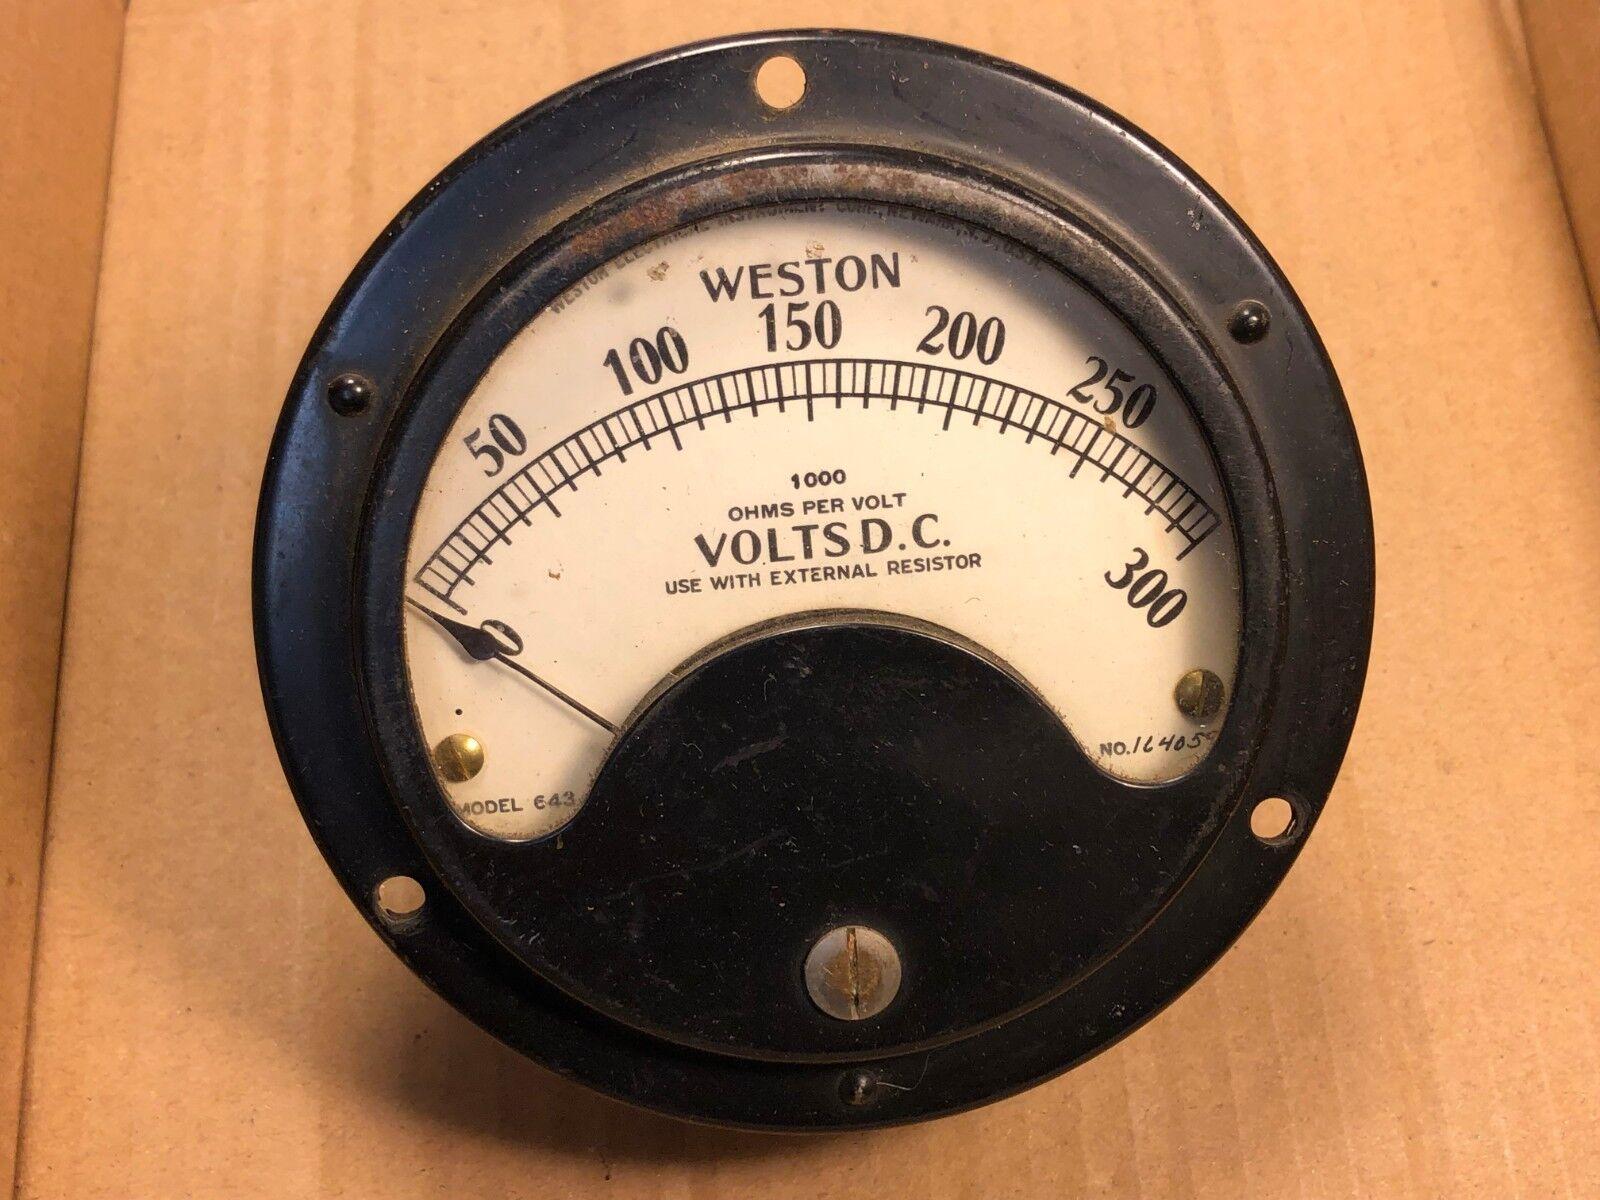 Large Antique Weston DC Volt Meter Measures 0-300 VDC Model 643 Gauge Guaranteed